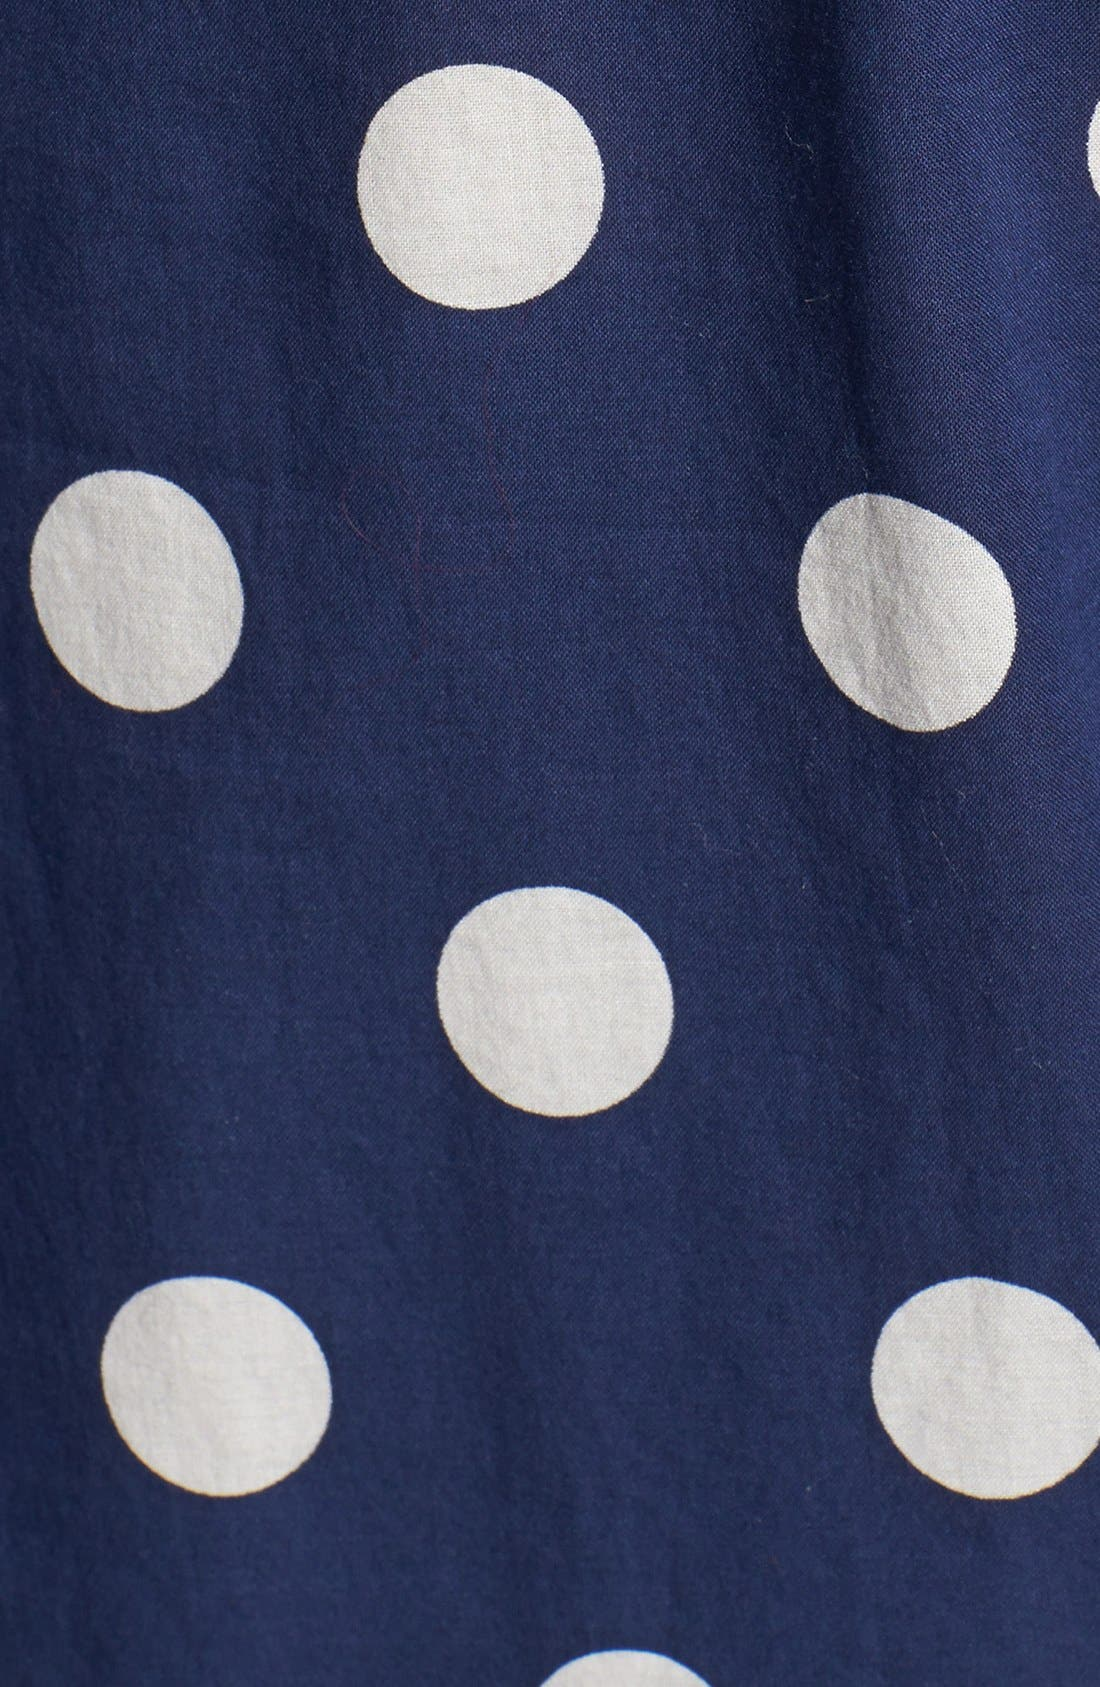 Alternate Image 3  - Equipment 'Reese' Polka Dot Cotton Shirt